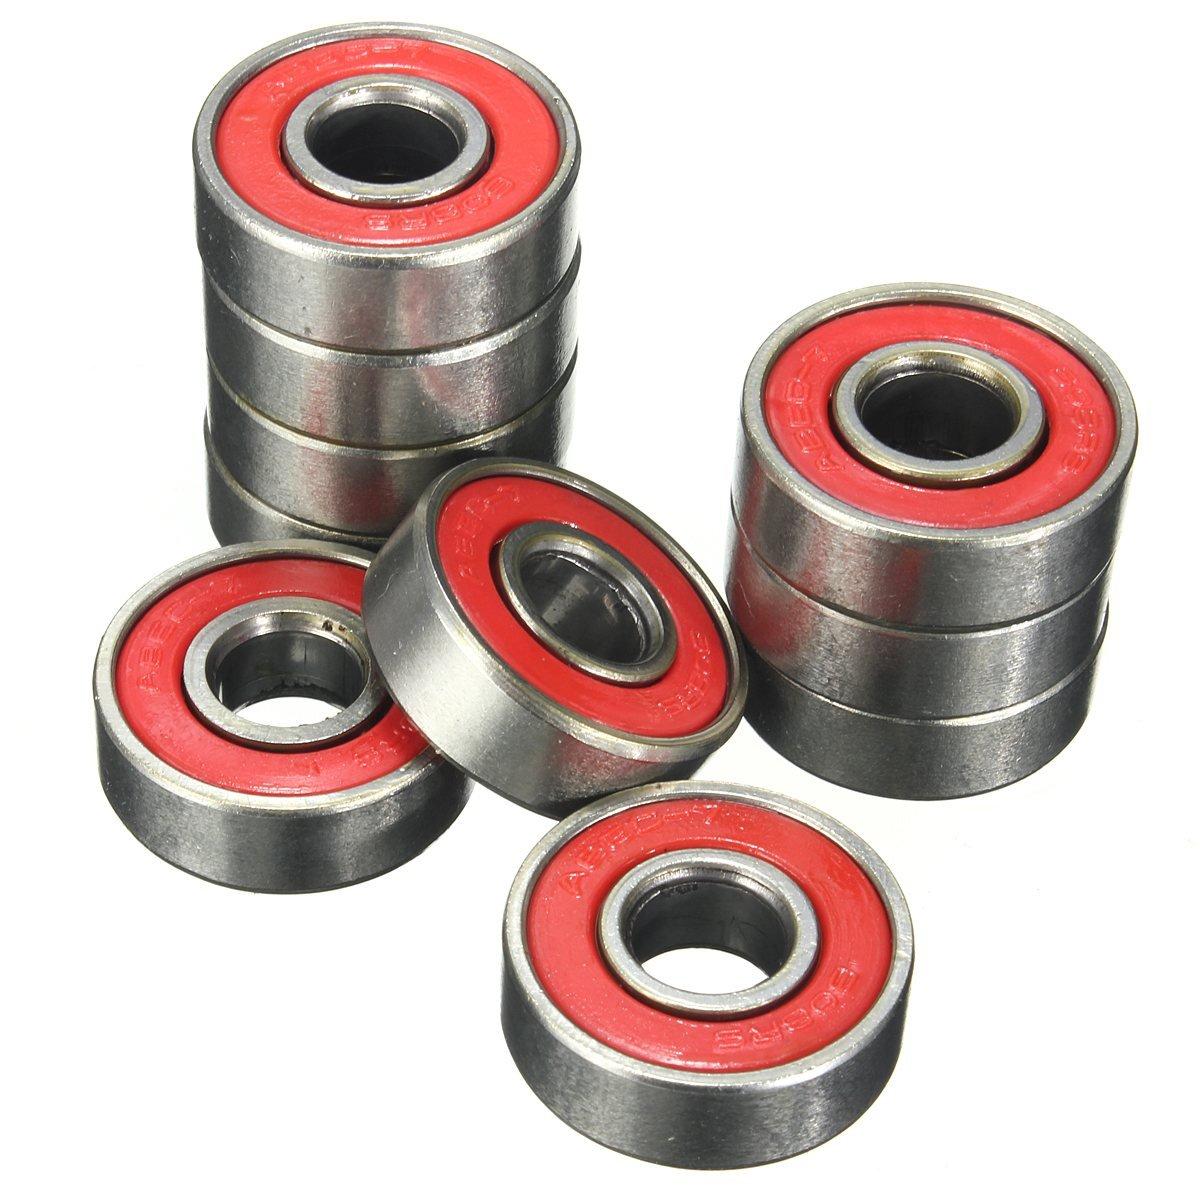 Ochoos 10pcs ABEC-5 608 2RS Inline Roller Skate Wheel Bearing Anti-Rust Skateboard Wheel Bearing Red Sealed 2.1 x 2.1 x 0.7cm Shaft